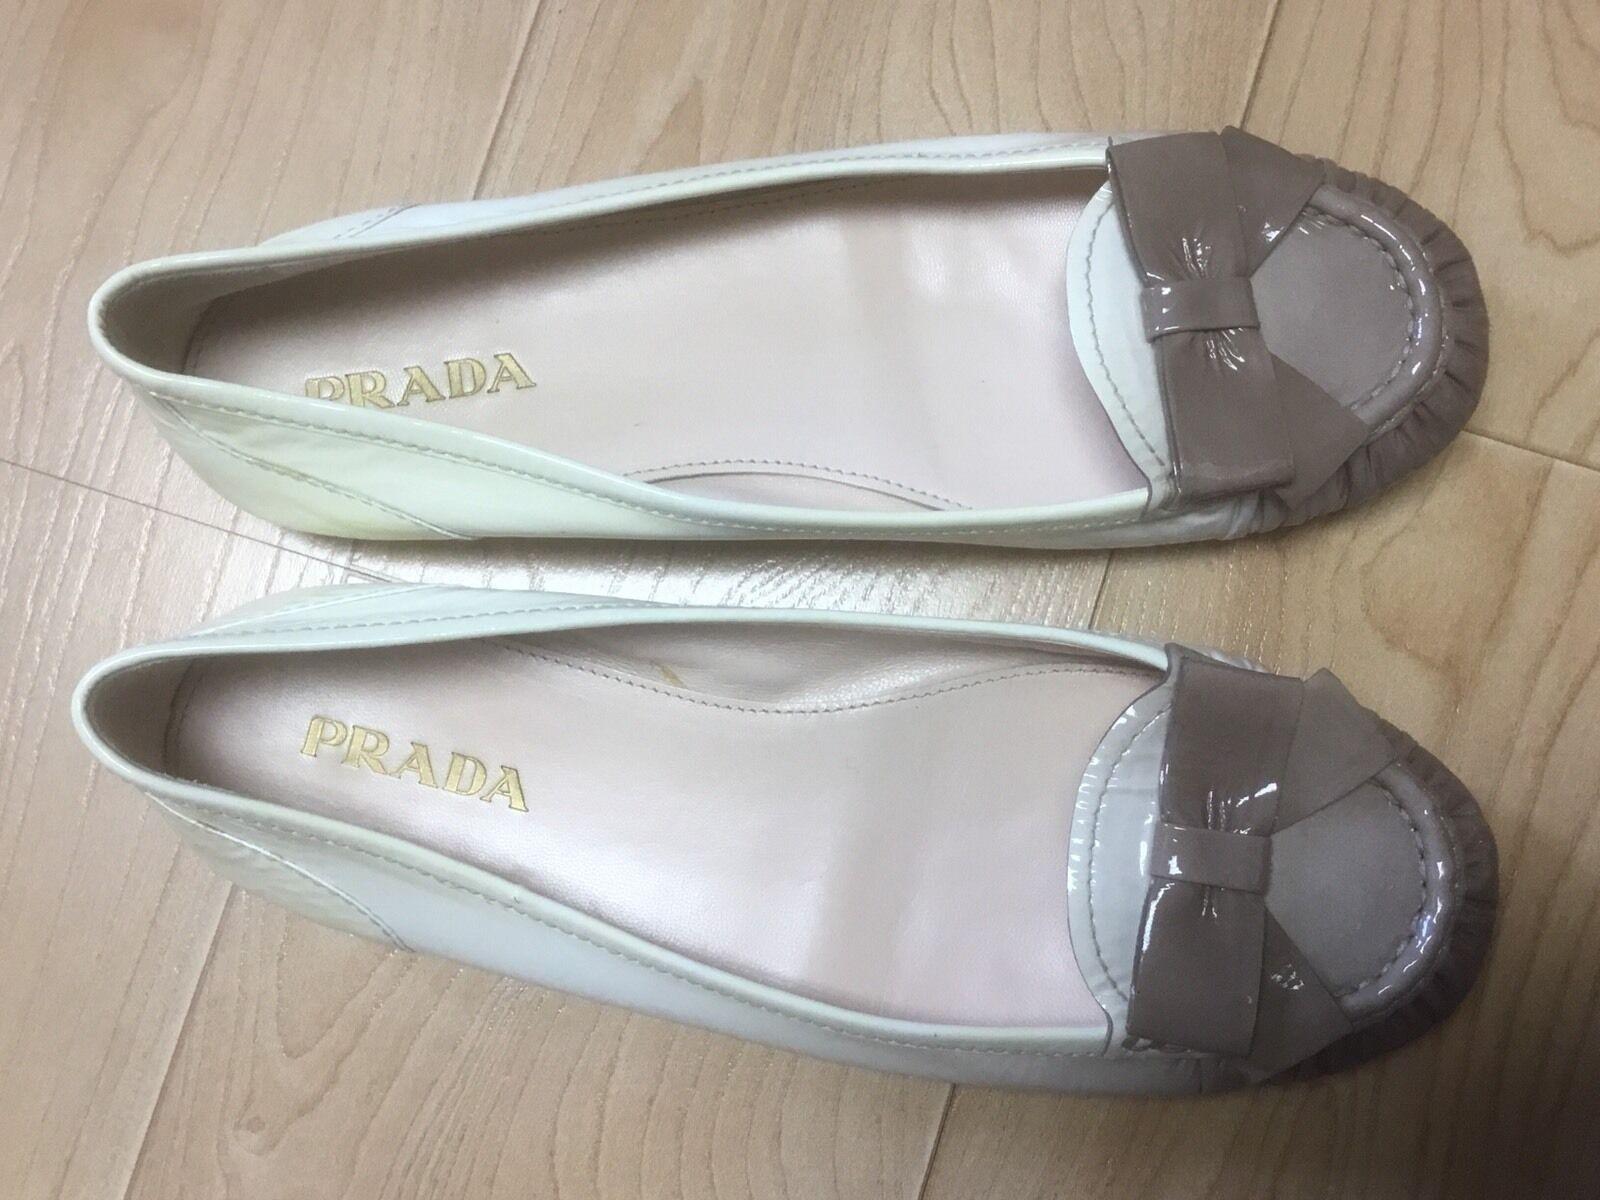 PRADA 7.5 Ombre Beige Gray Loafers Patent Leather Sz 7.5 PRADA $599 483da2